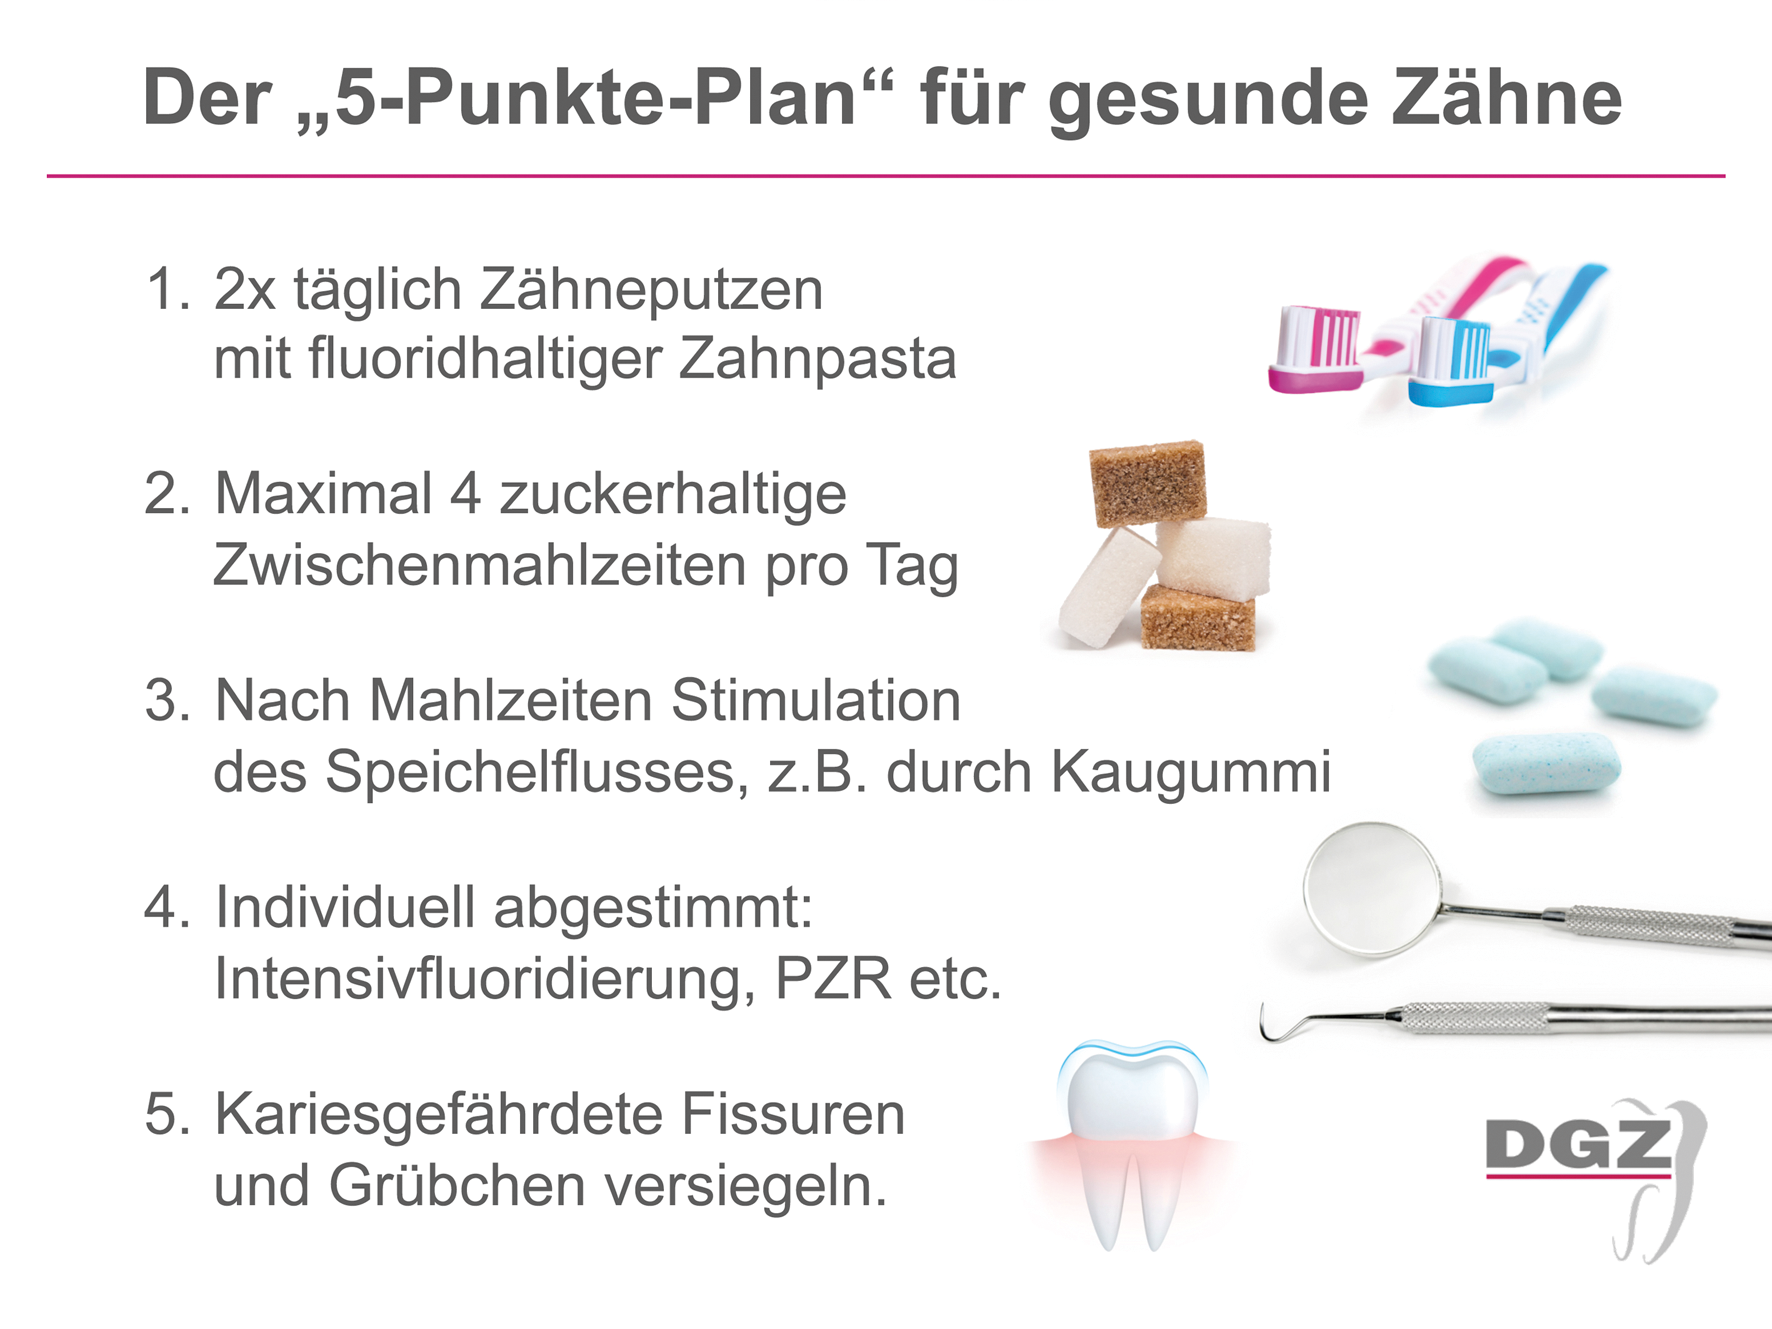 5-Punkte-Plan